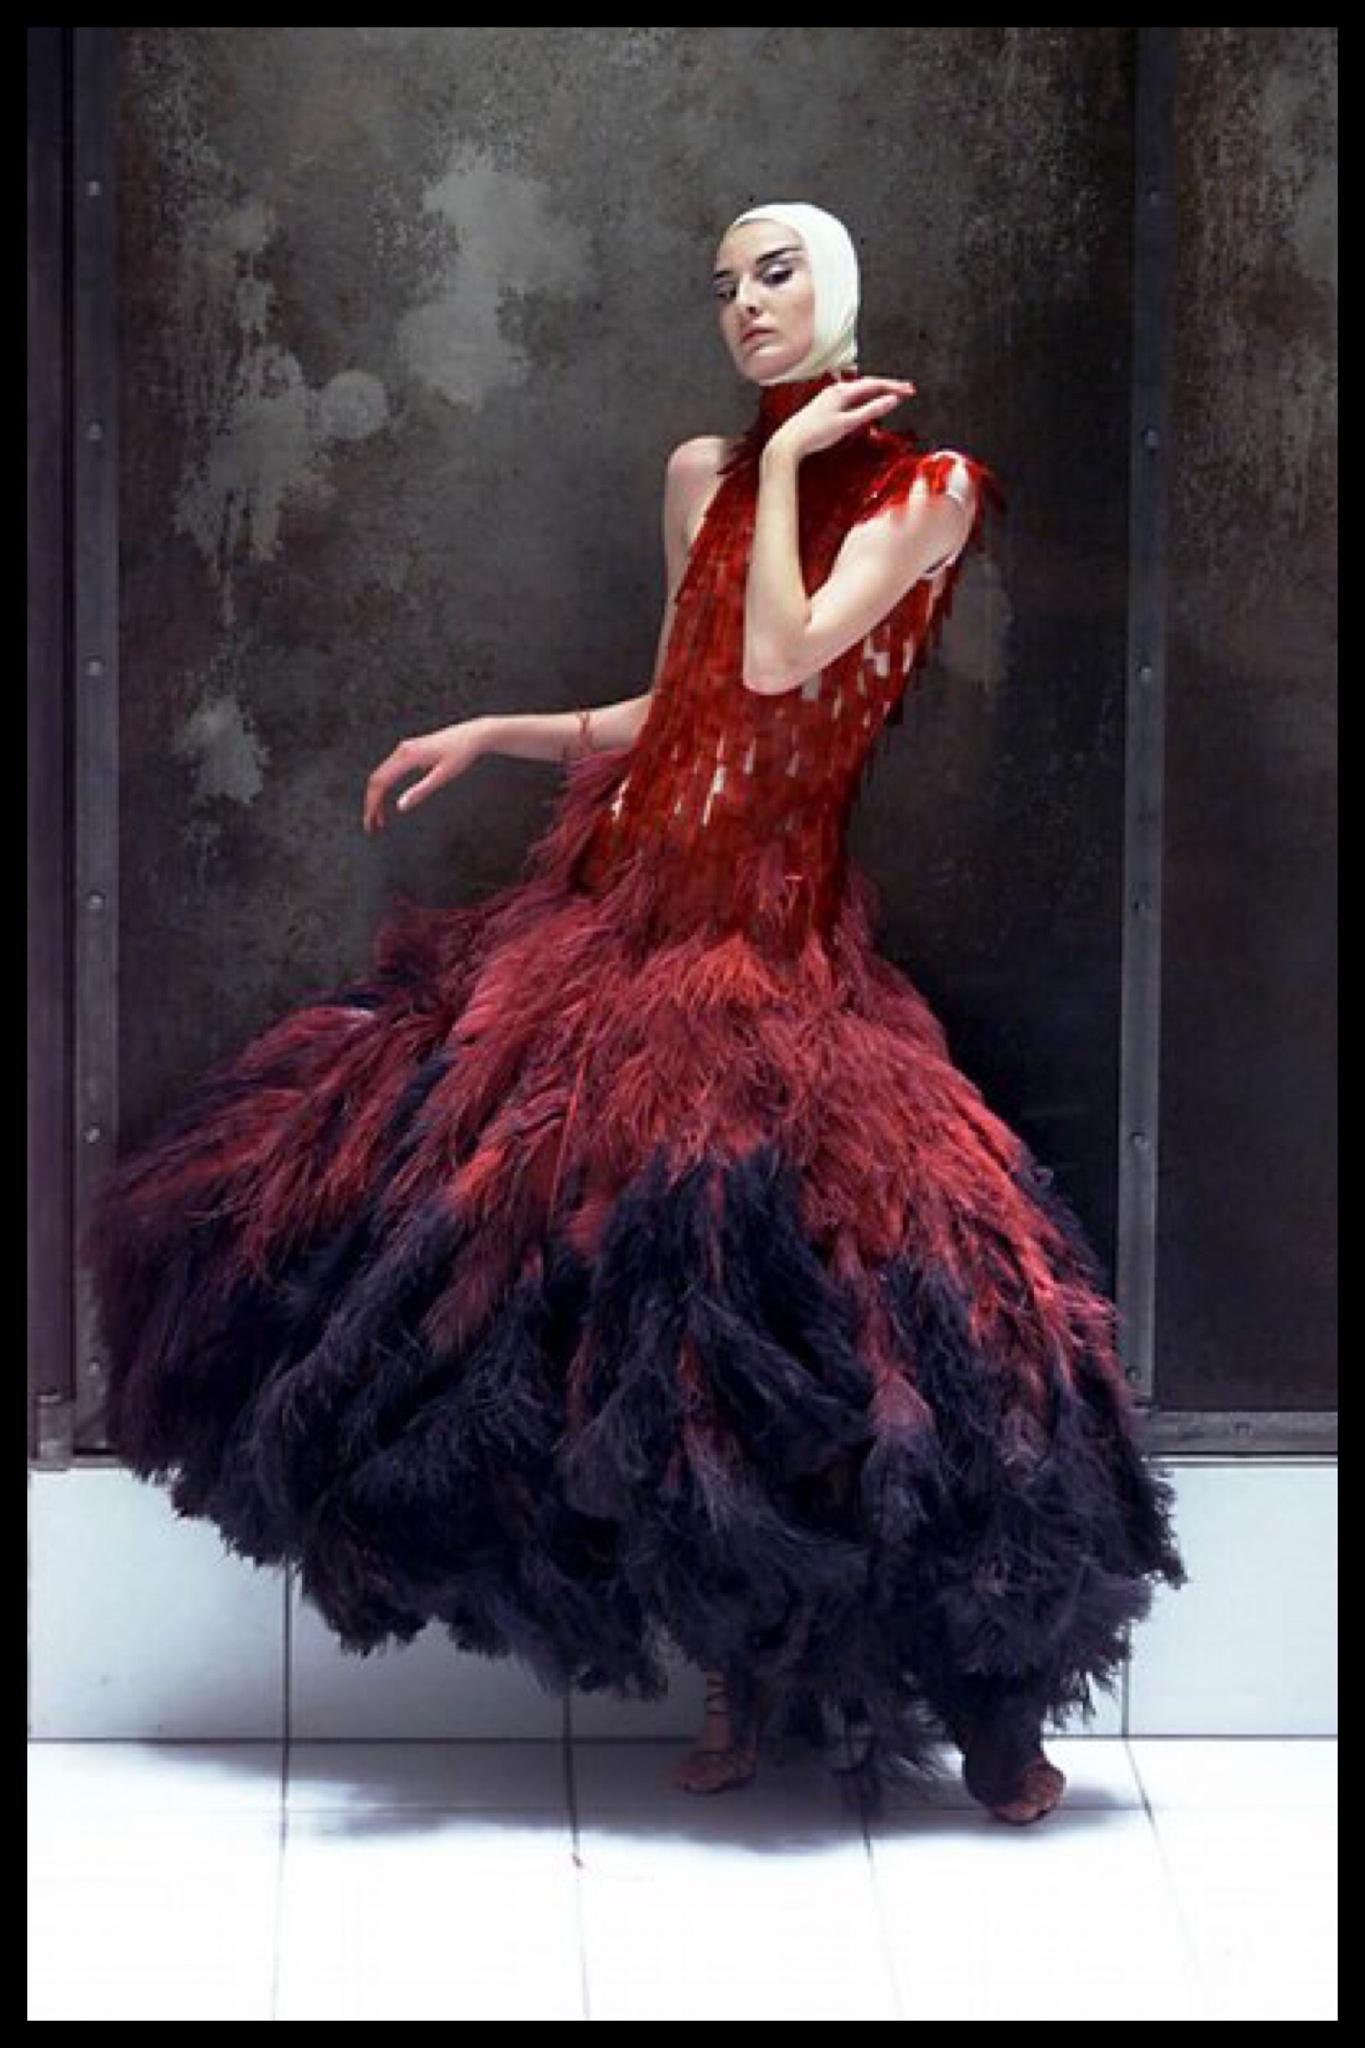 Alexander McQueen: Savage Beauty | 14 March – 19 July 2015